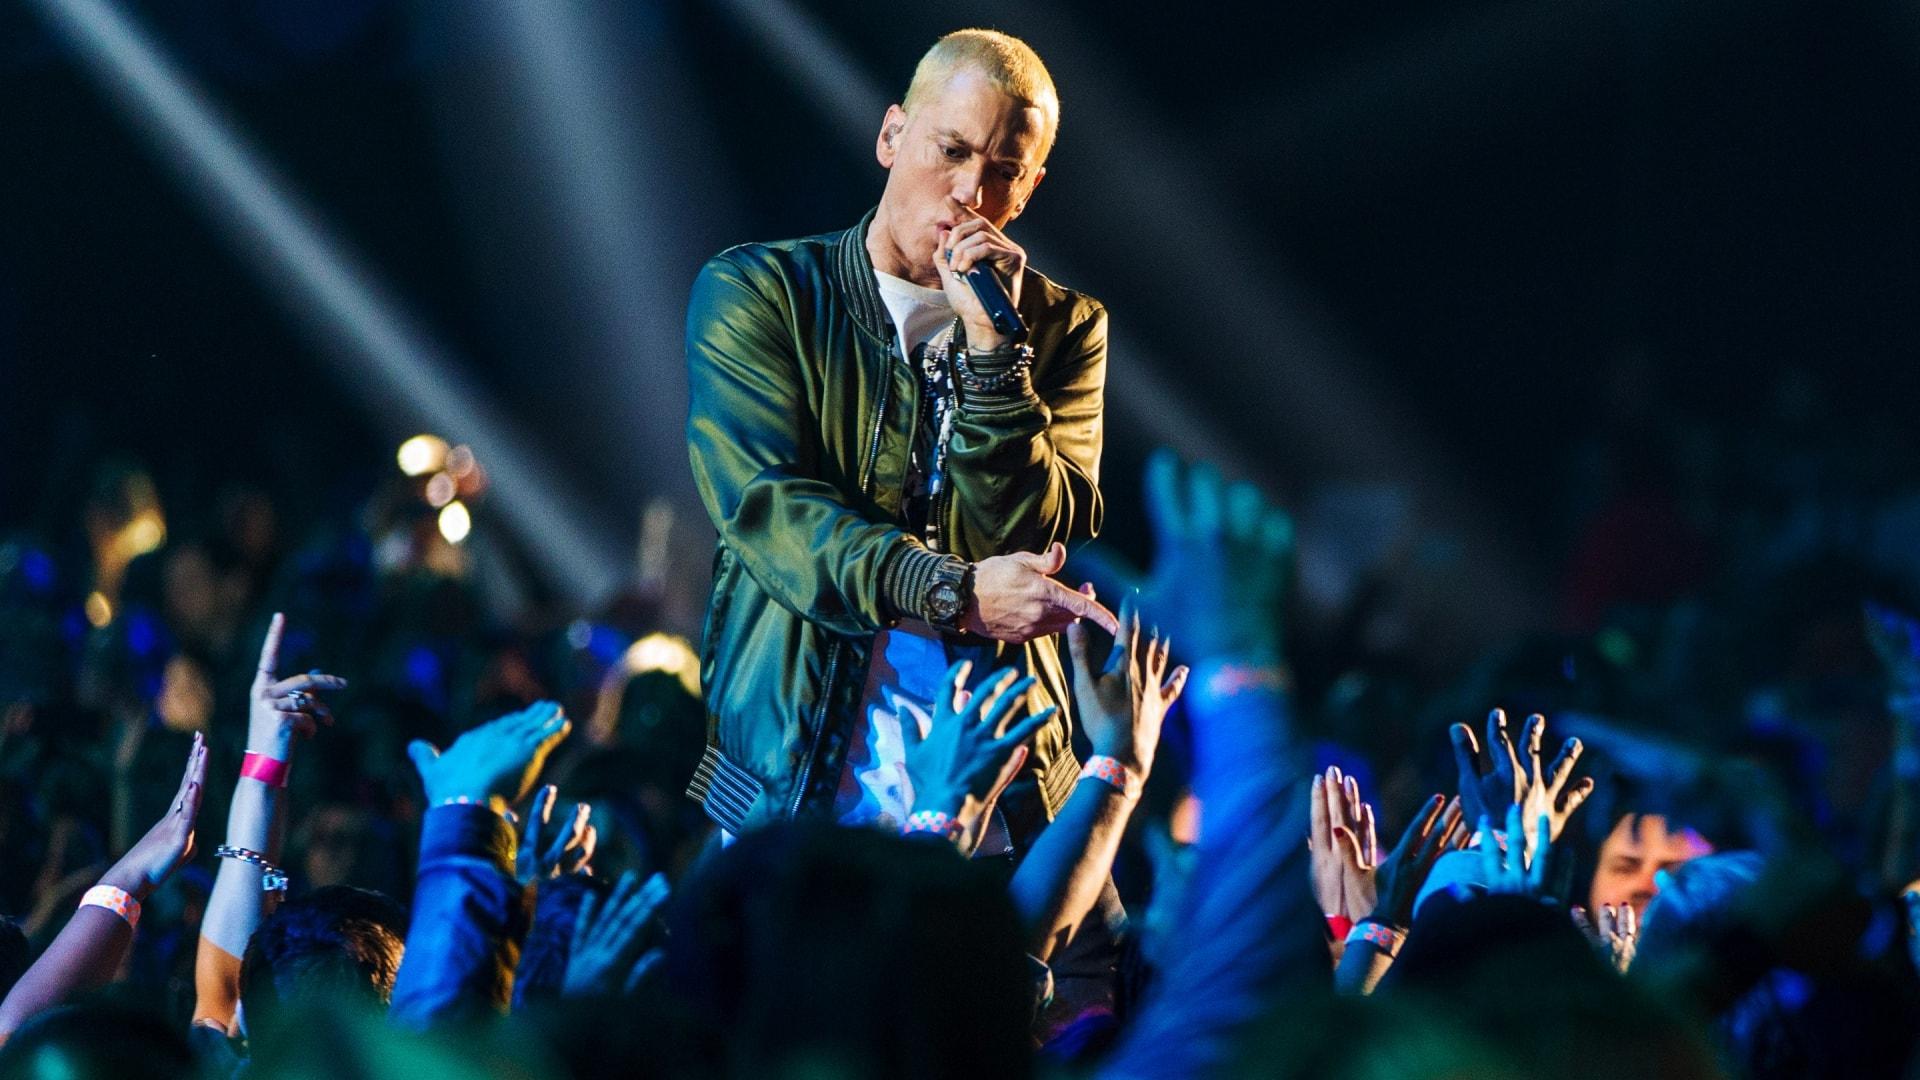 Eminem full hd wallpapers